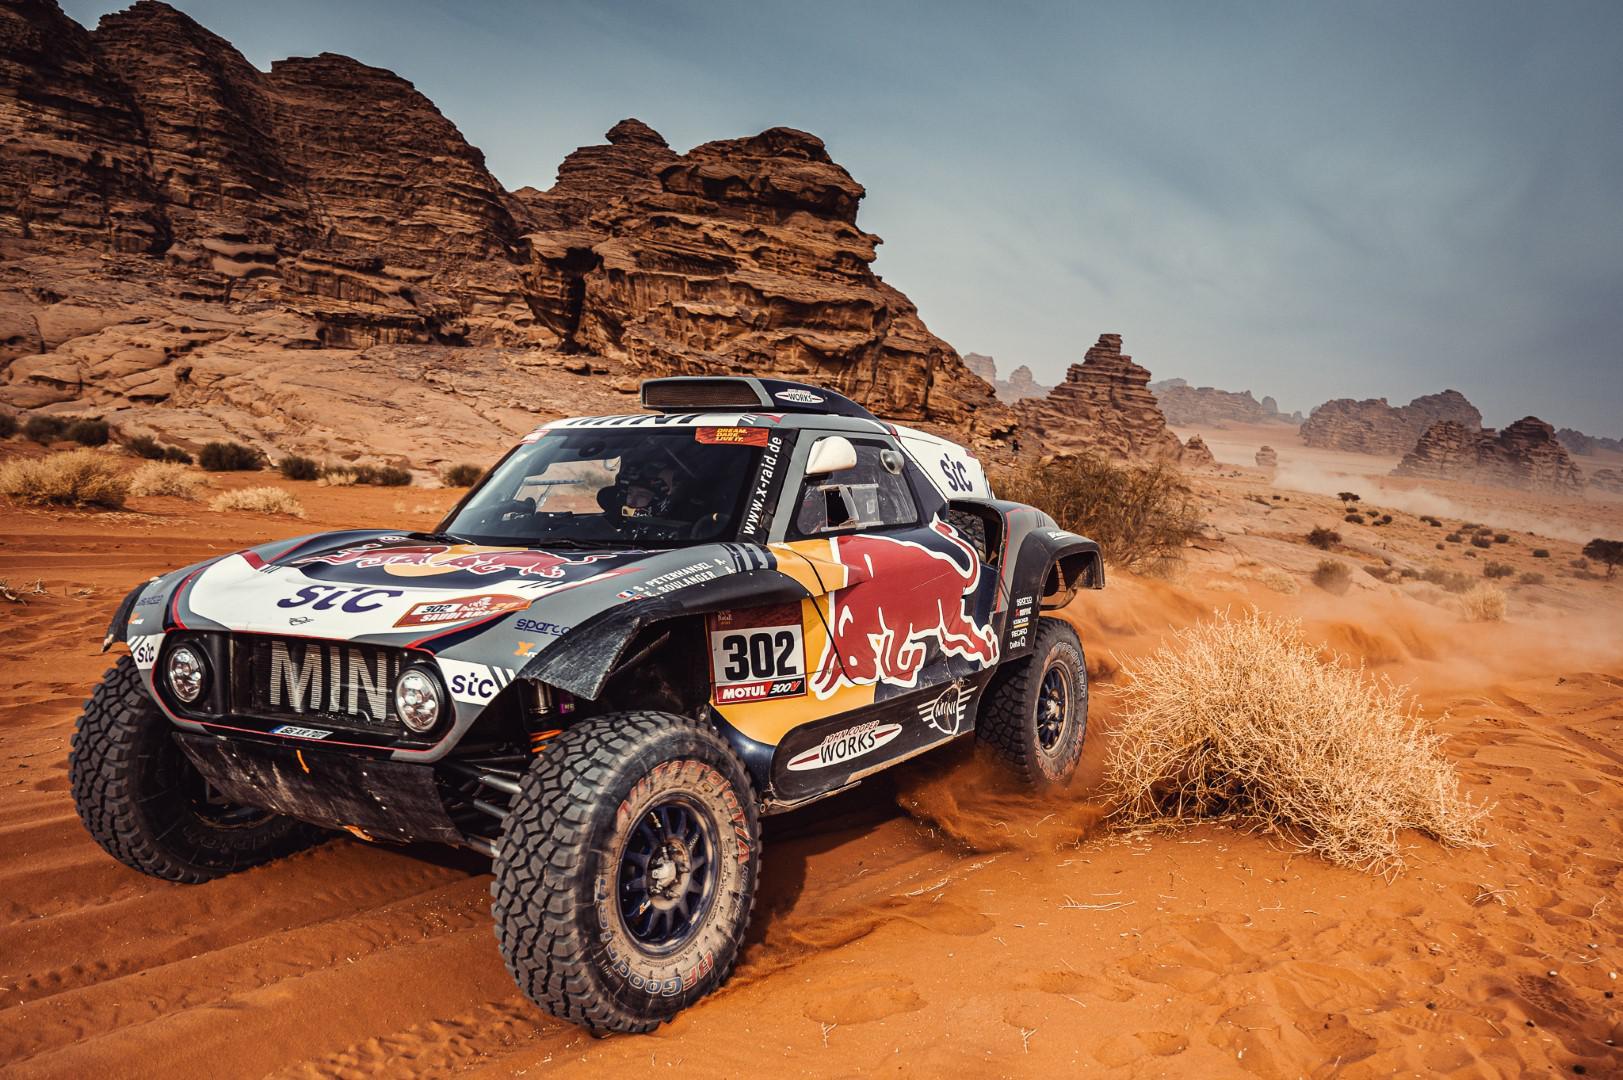 rally-dakar-2021-6eme-victoire-au-general-pour-mini-1416-2.jpg